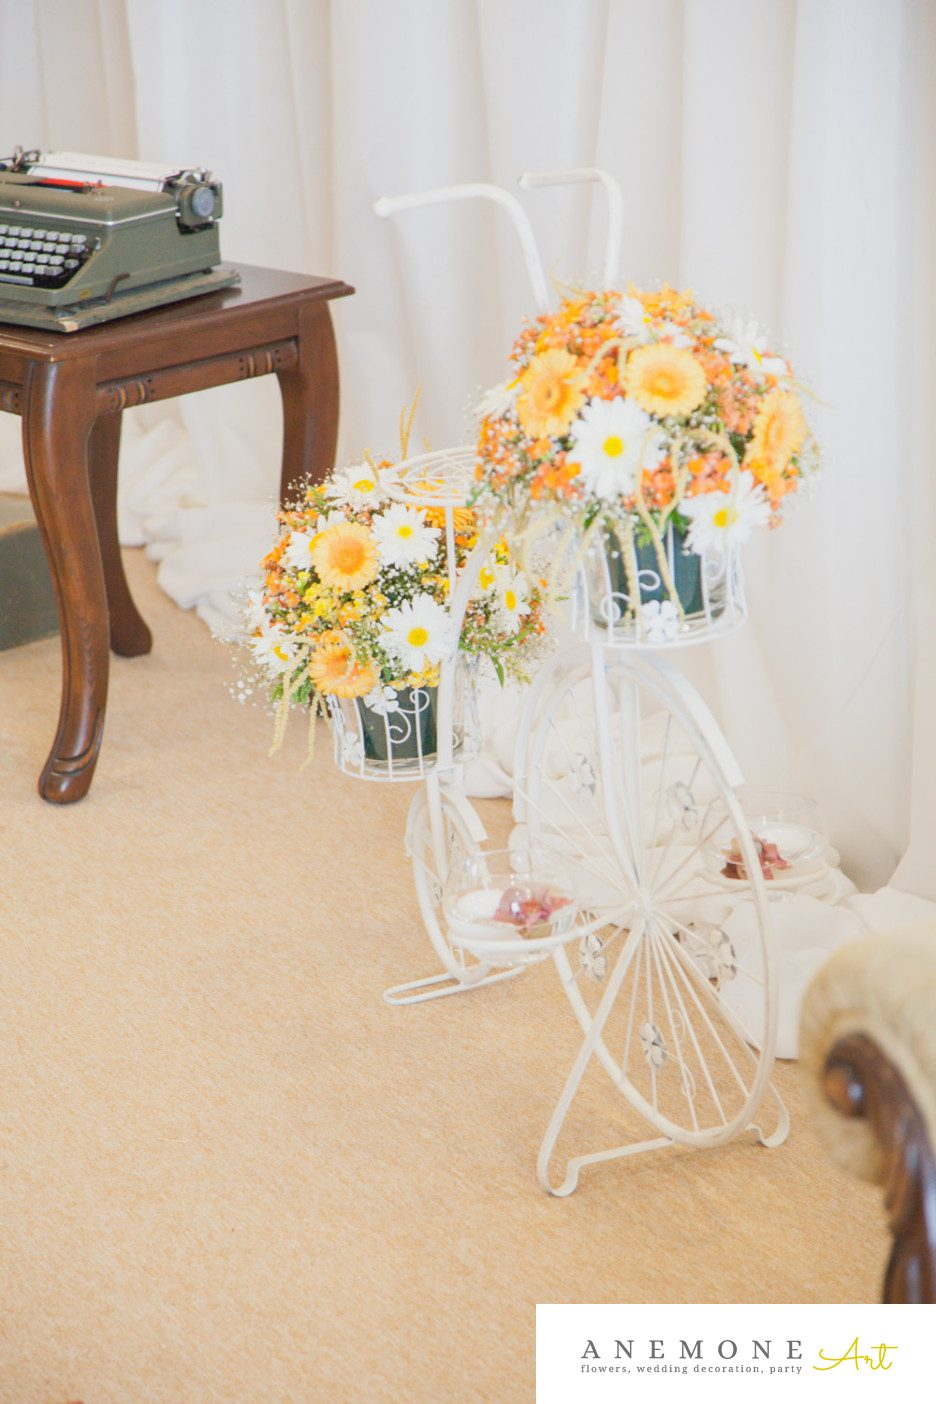 Poza, foto cu Flori de nunta bicicleta, decor sala, galben in Arad, Timisoara, Oradea (wedding flowers, bouquets) nunta Arad, Timisoara, Oradea